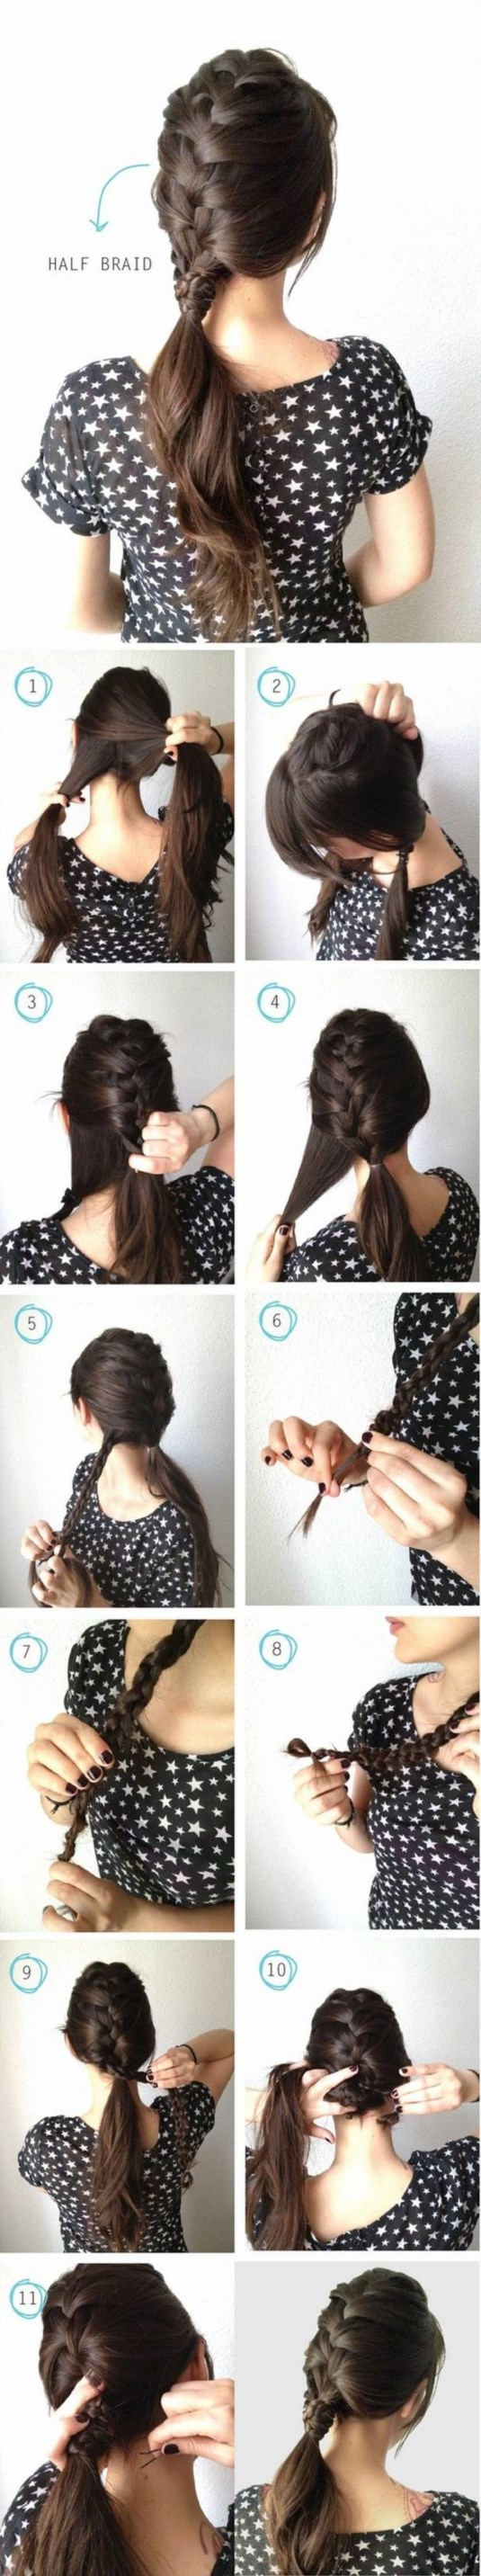 10-Fantastic-Easy-Hairstyles-Tutorials-10